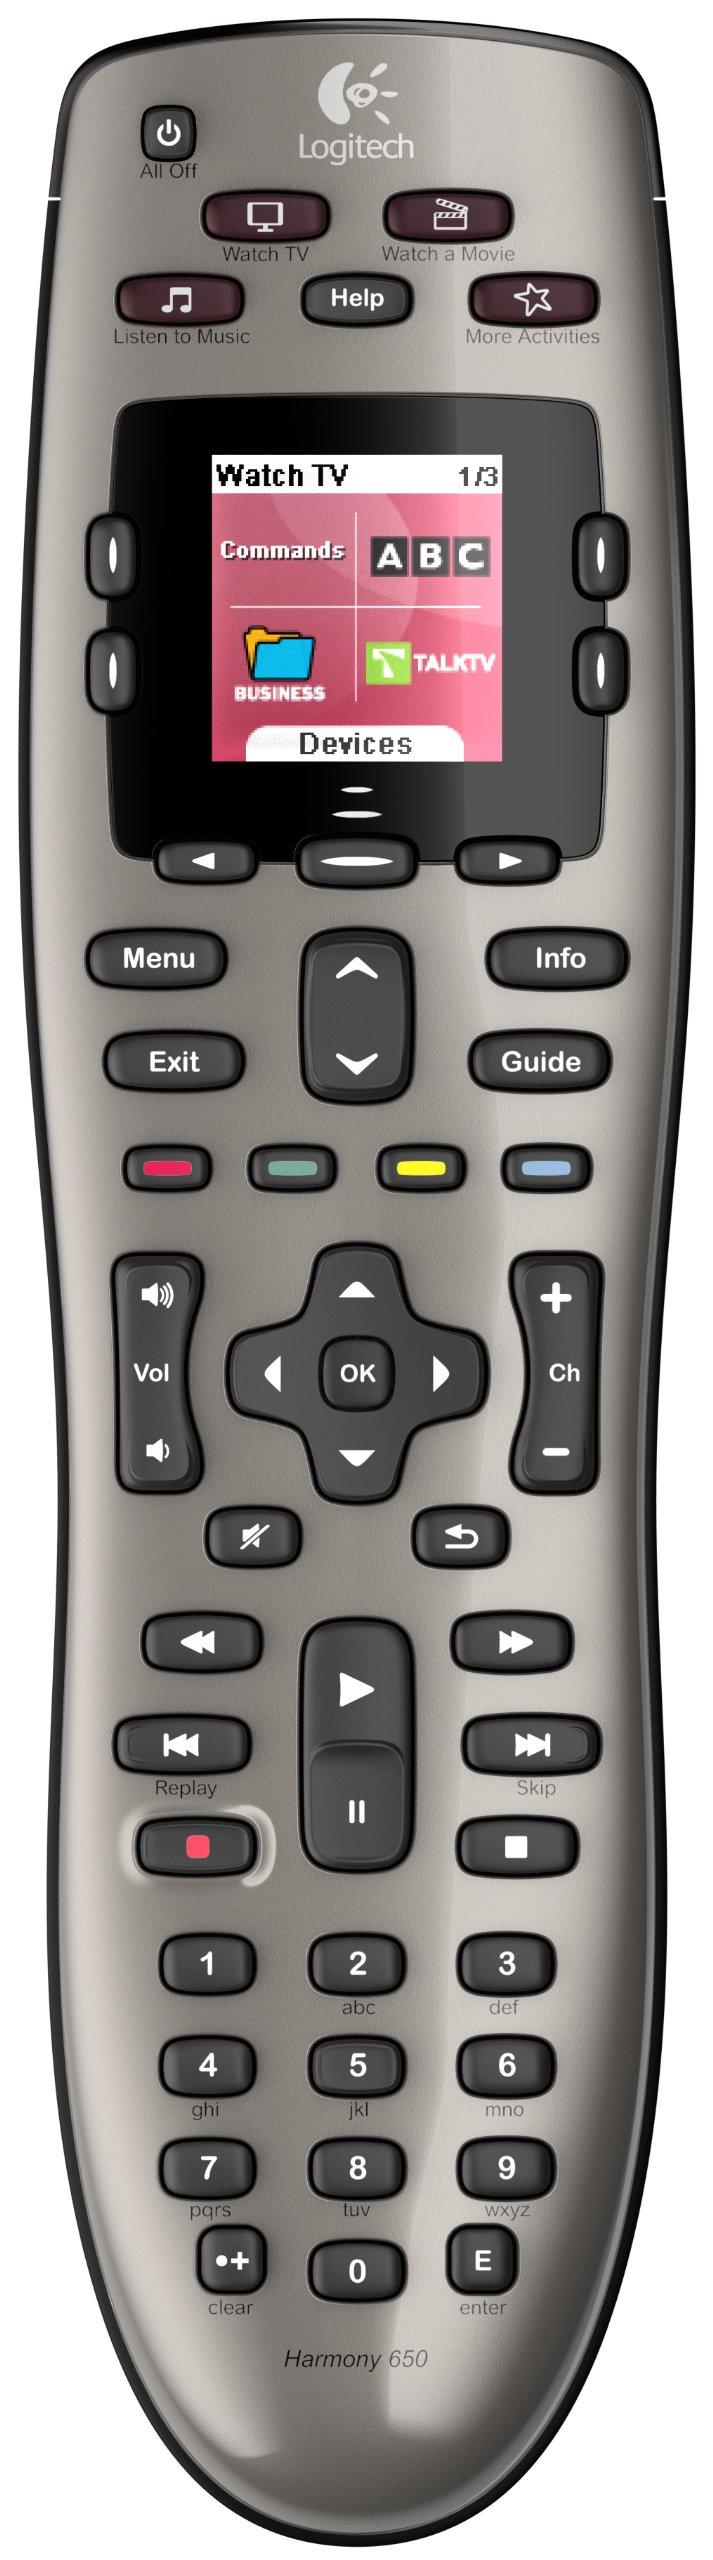 Logitech Harmony 650 Remote (Silver)